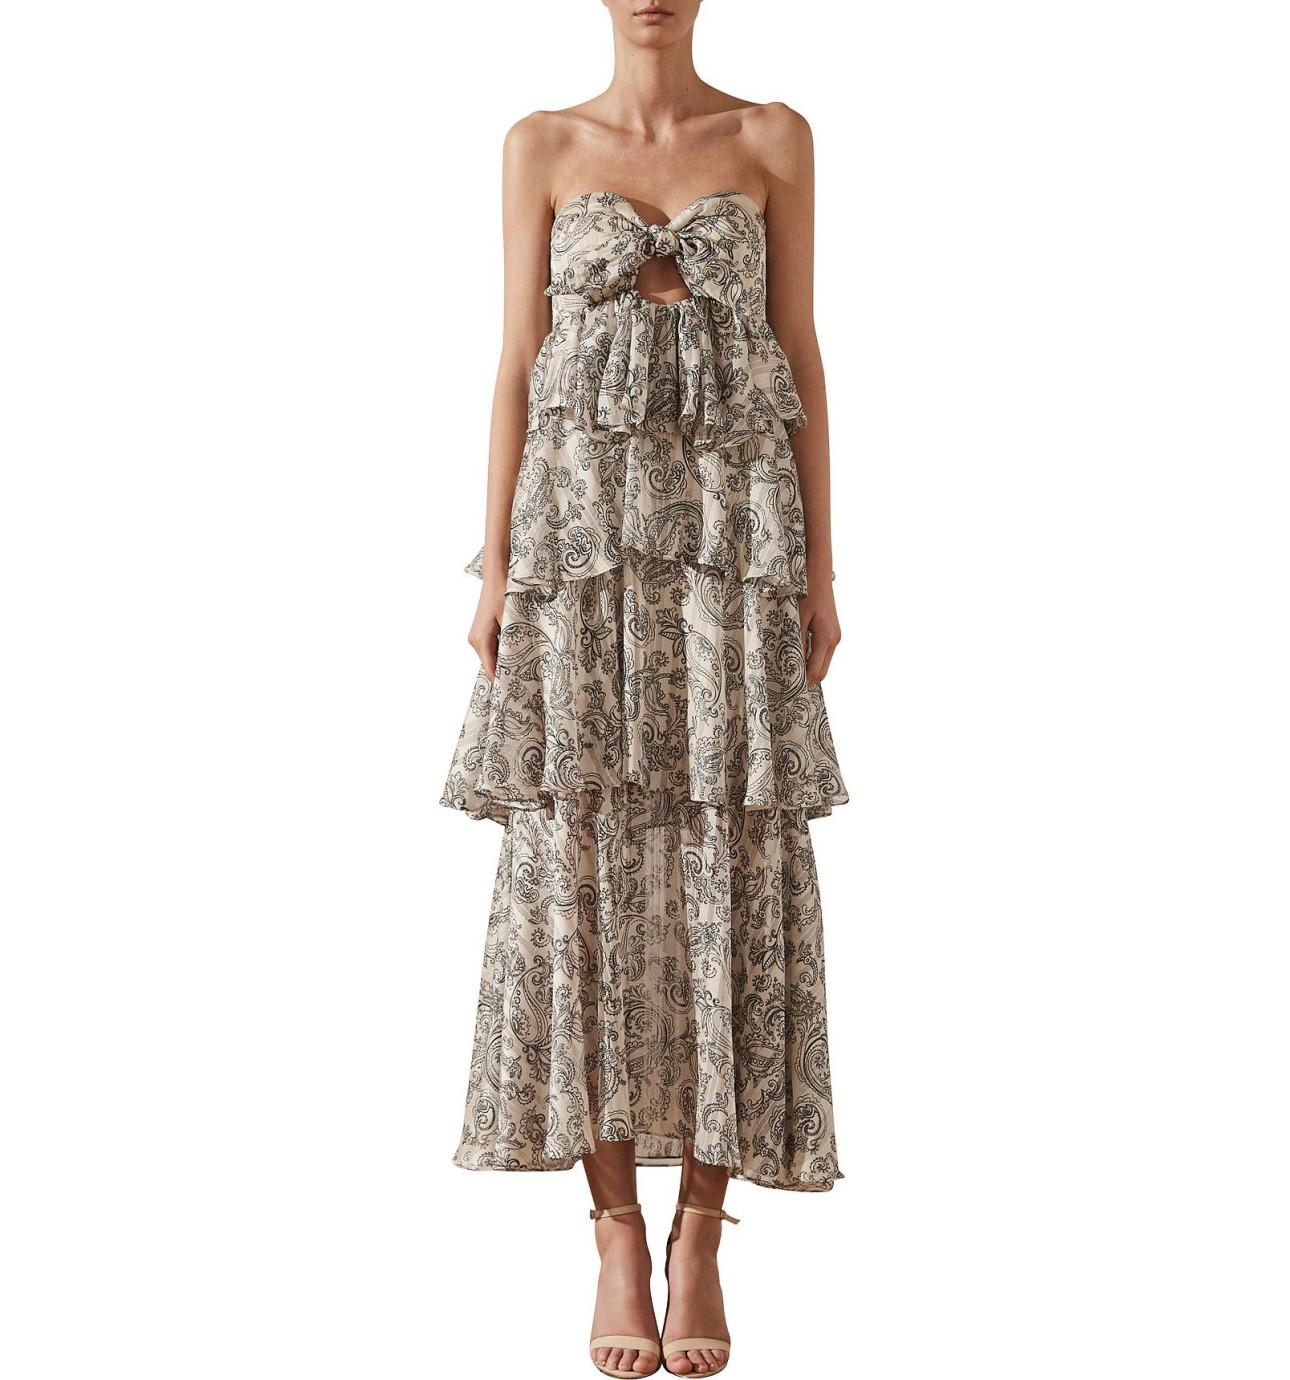 Shona joy dresses david jones marea tiered maxi dress ombrellifo Gallery